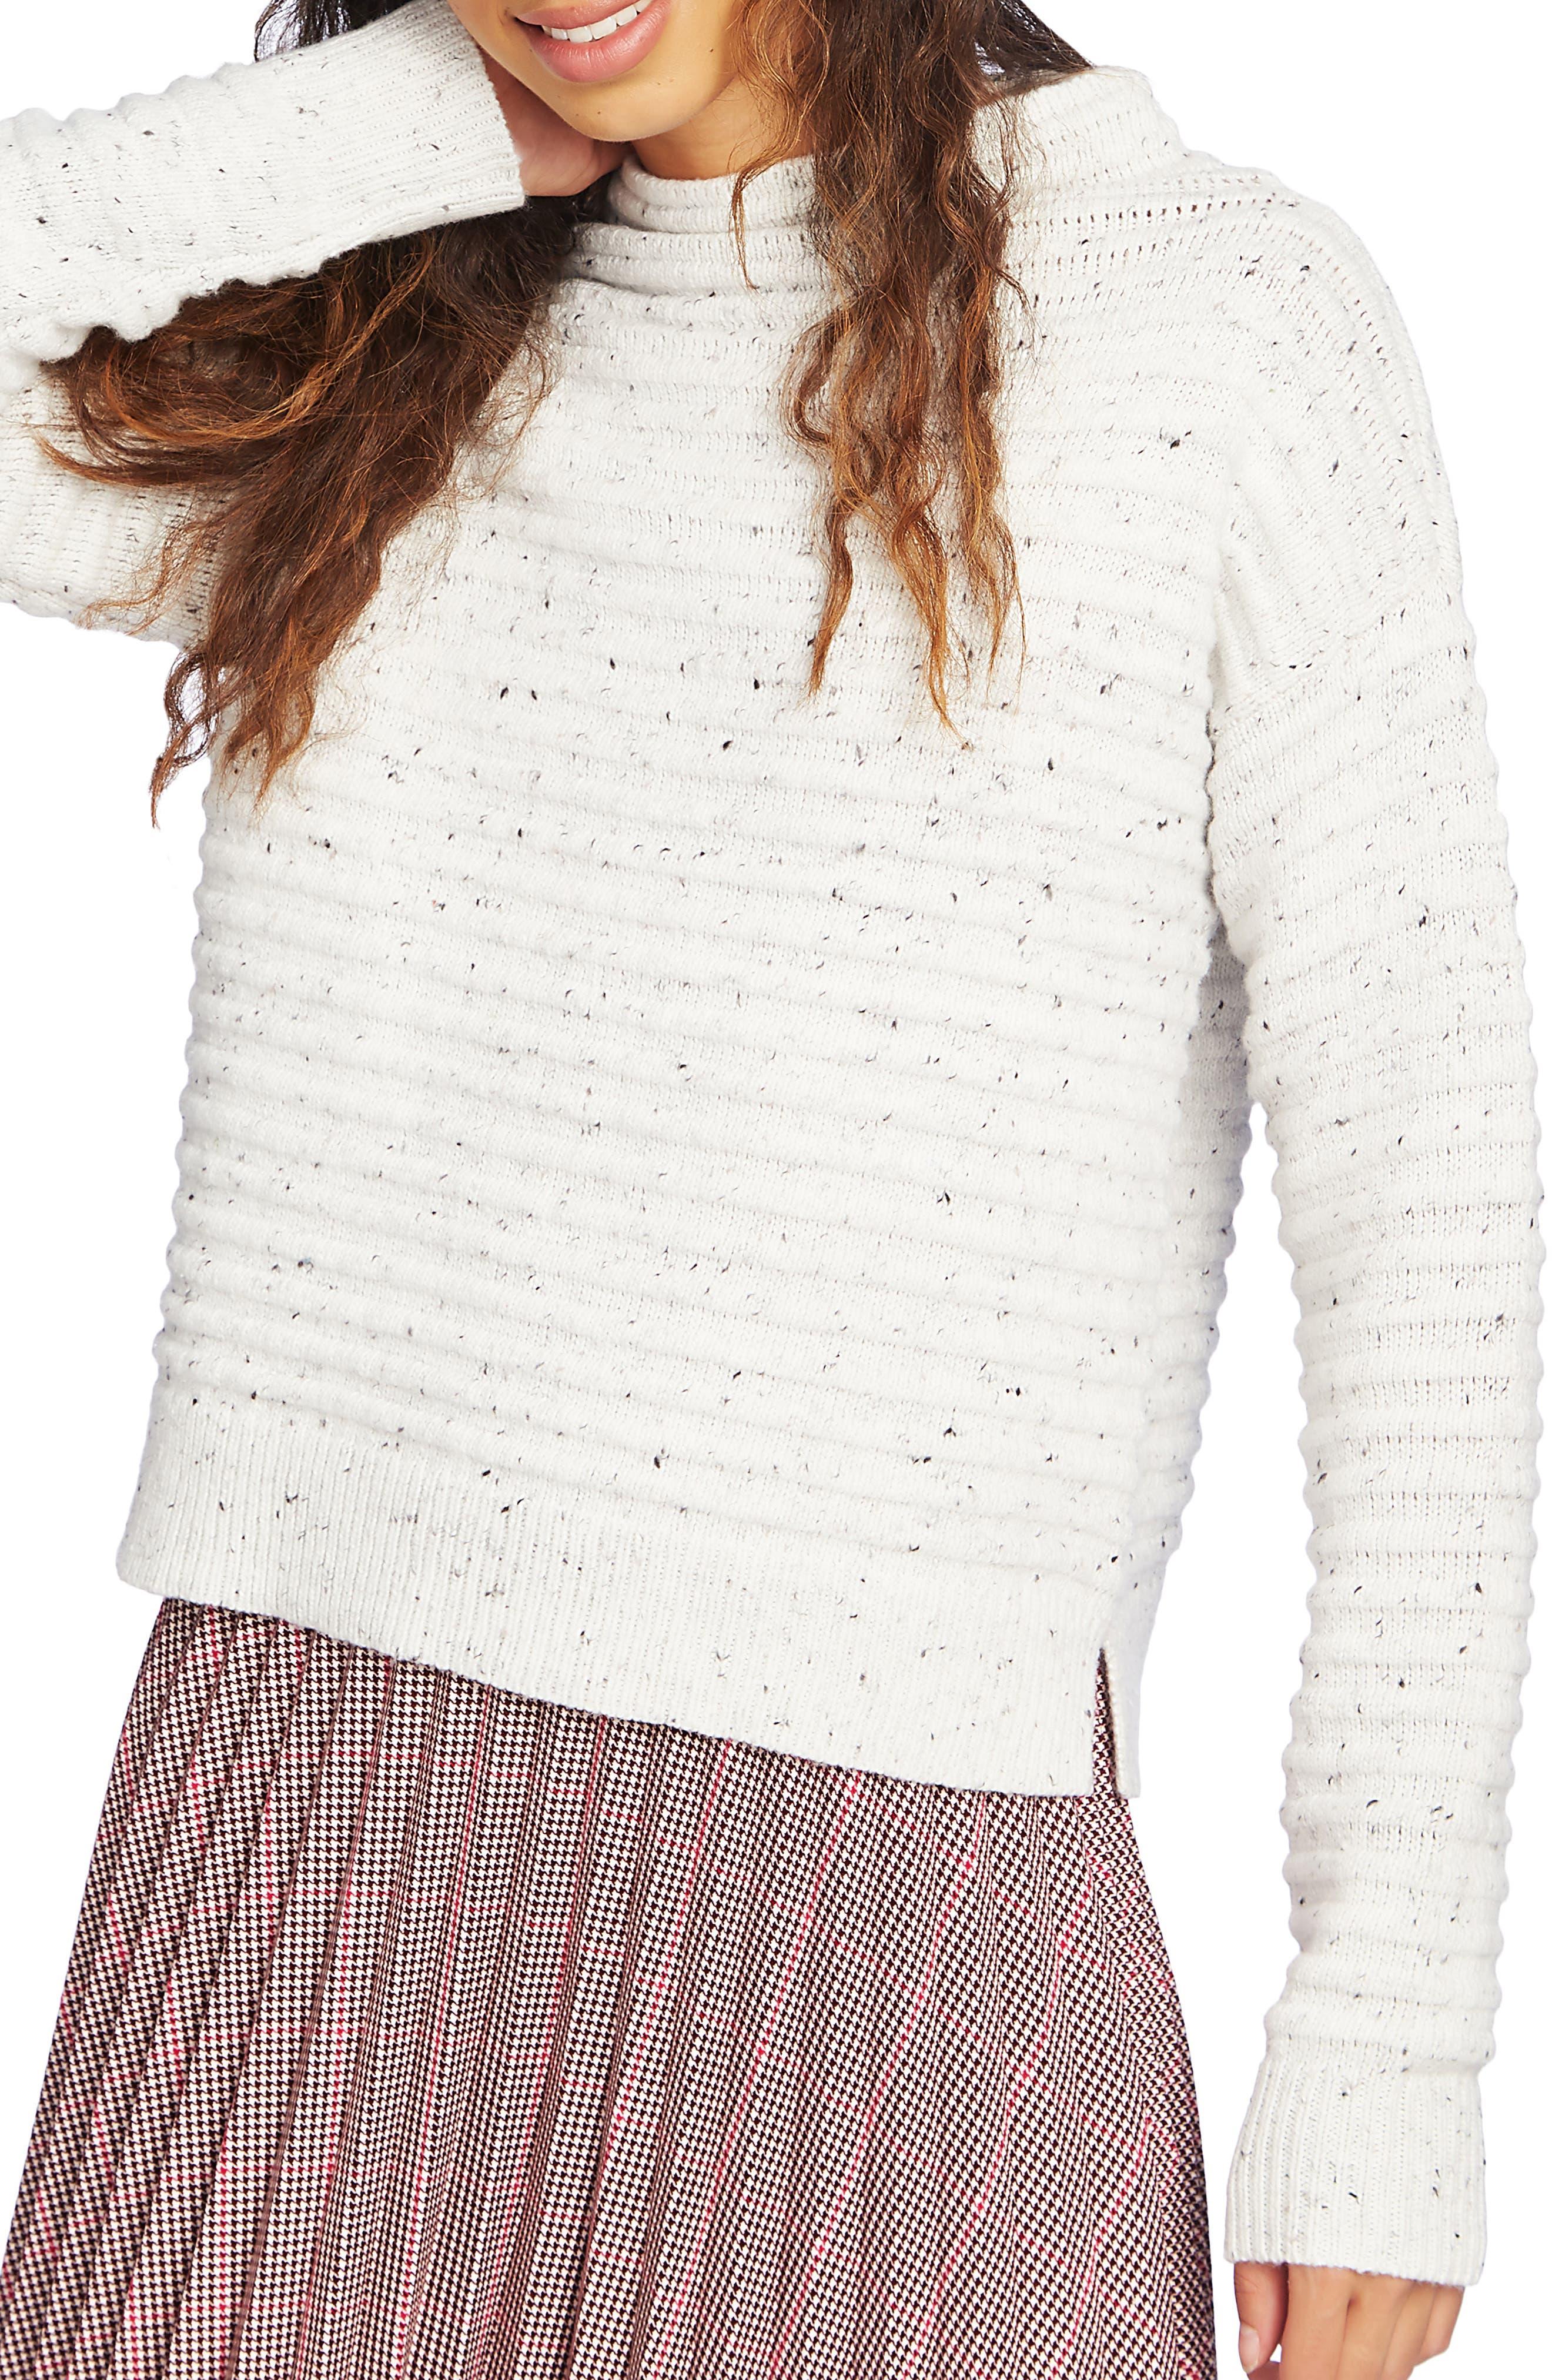 Court & Rowe Speckled Ottoman Turtleneck Sweater